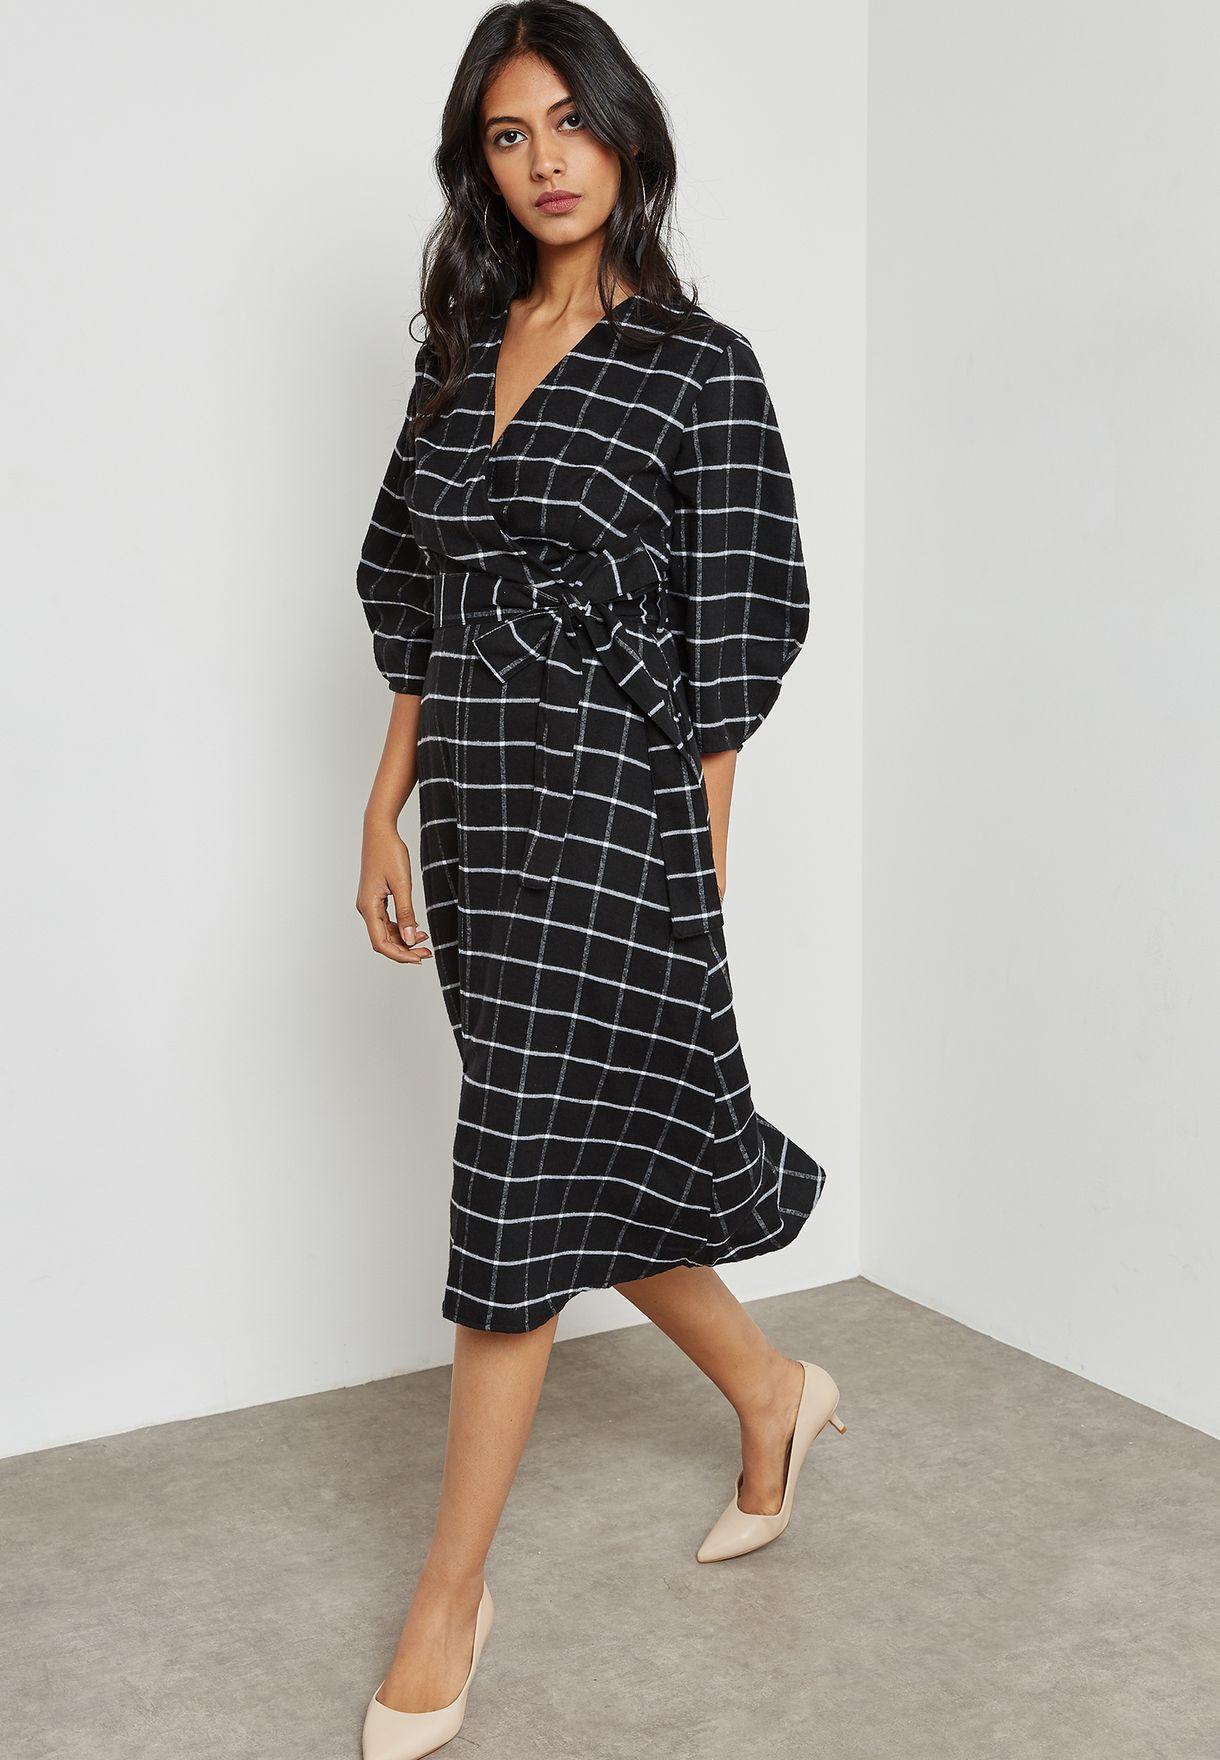 Checked Puffed Sleeve Self Tie Dress